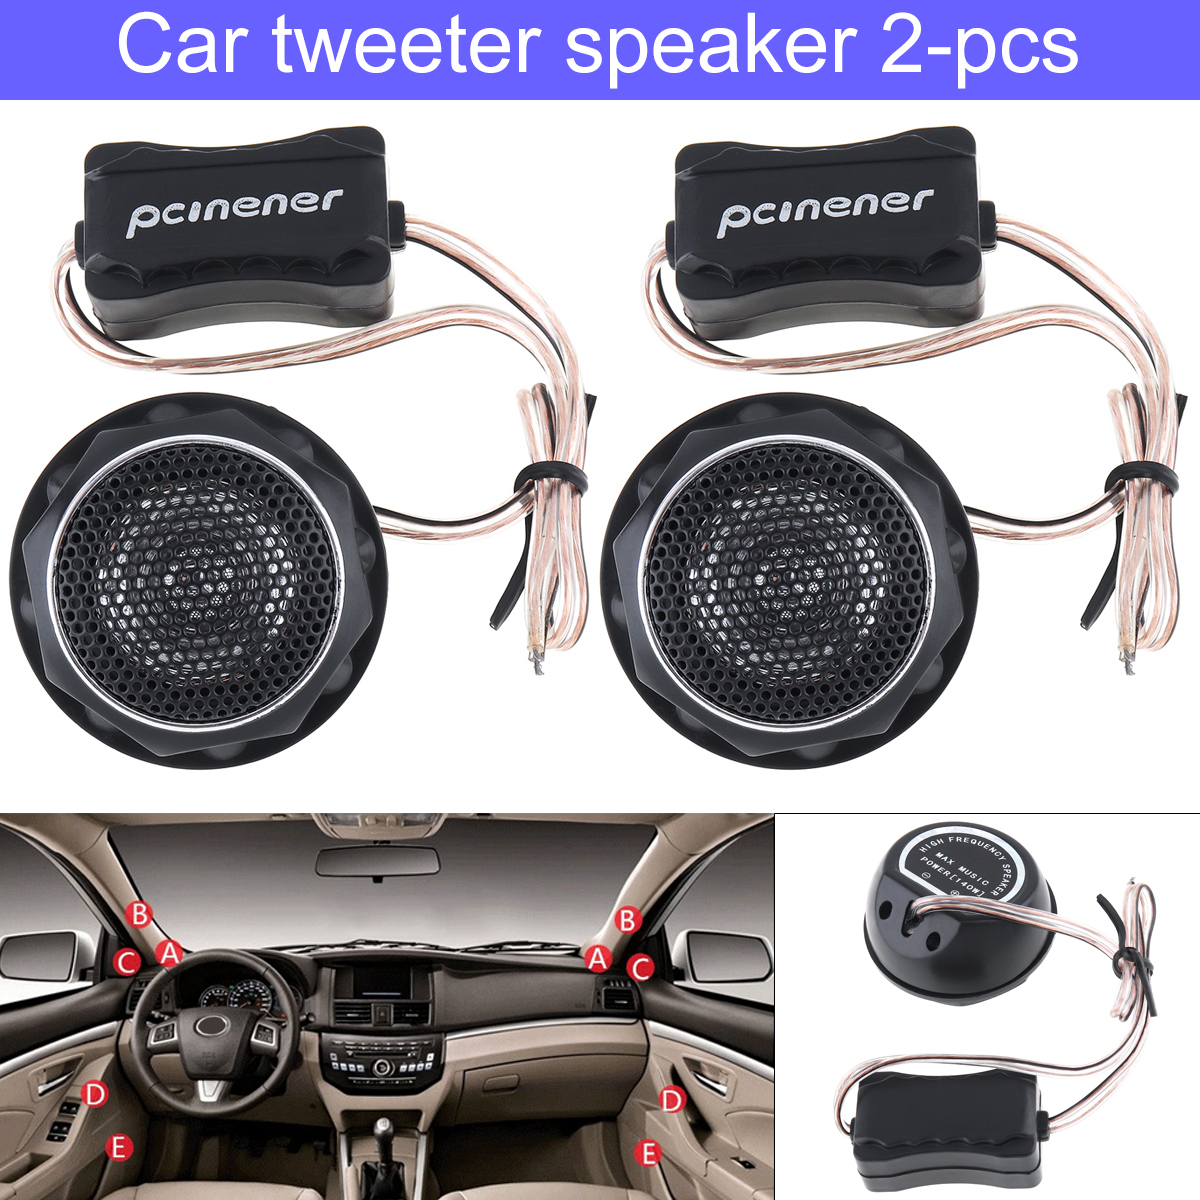 2pcs 12V 140W Car Speaker High Efficiency Mini Dome Tweeter Speakers Loundspeaker Lound speaker for Car Audio System YH-T280